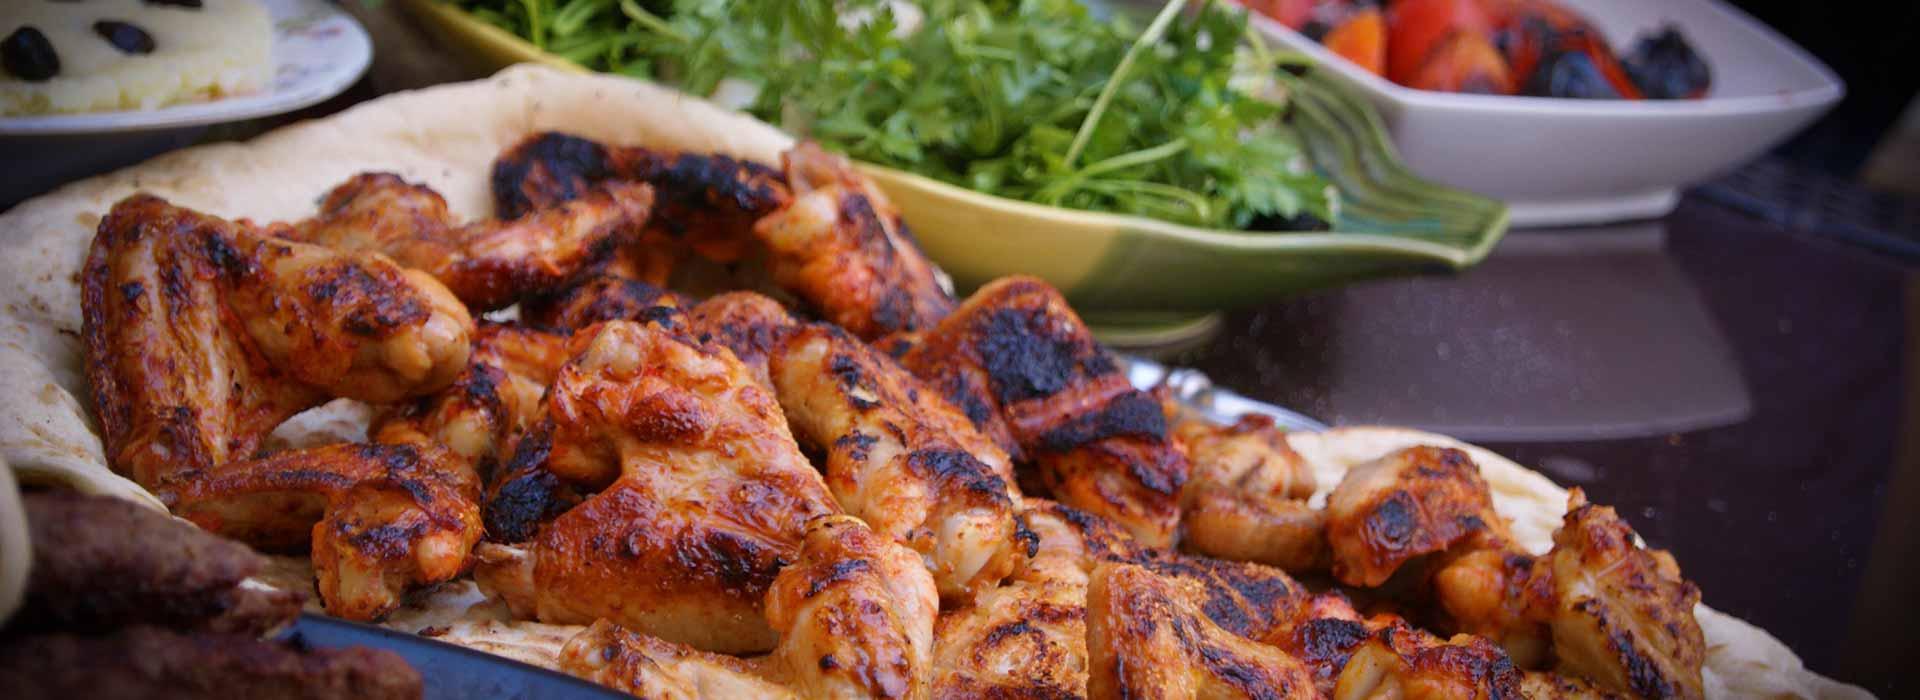 Larnaca Food